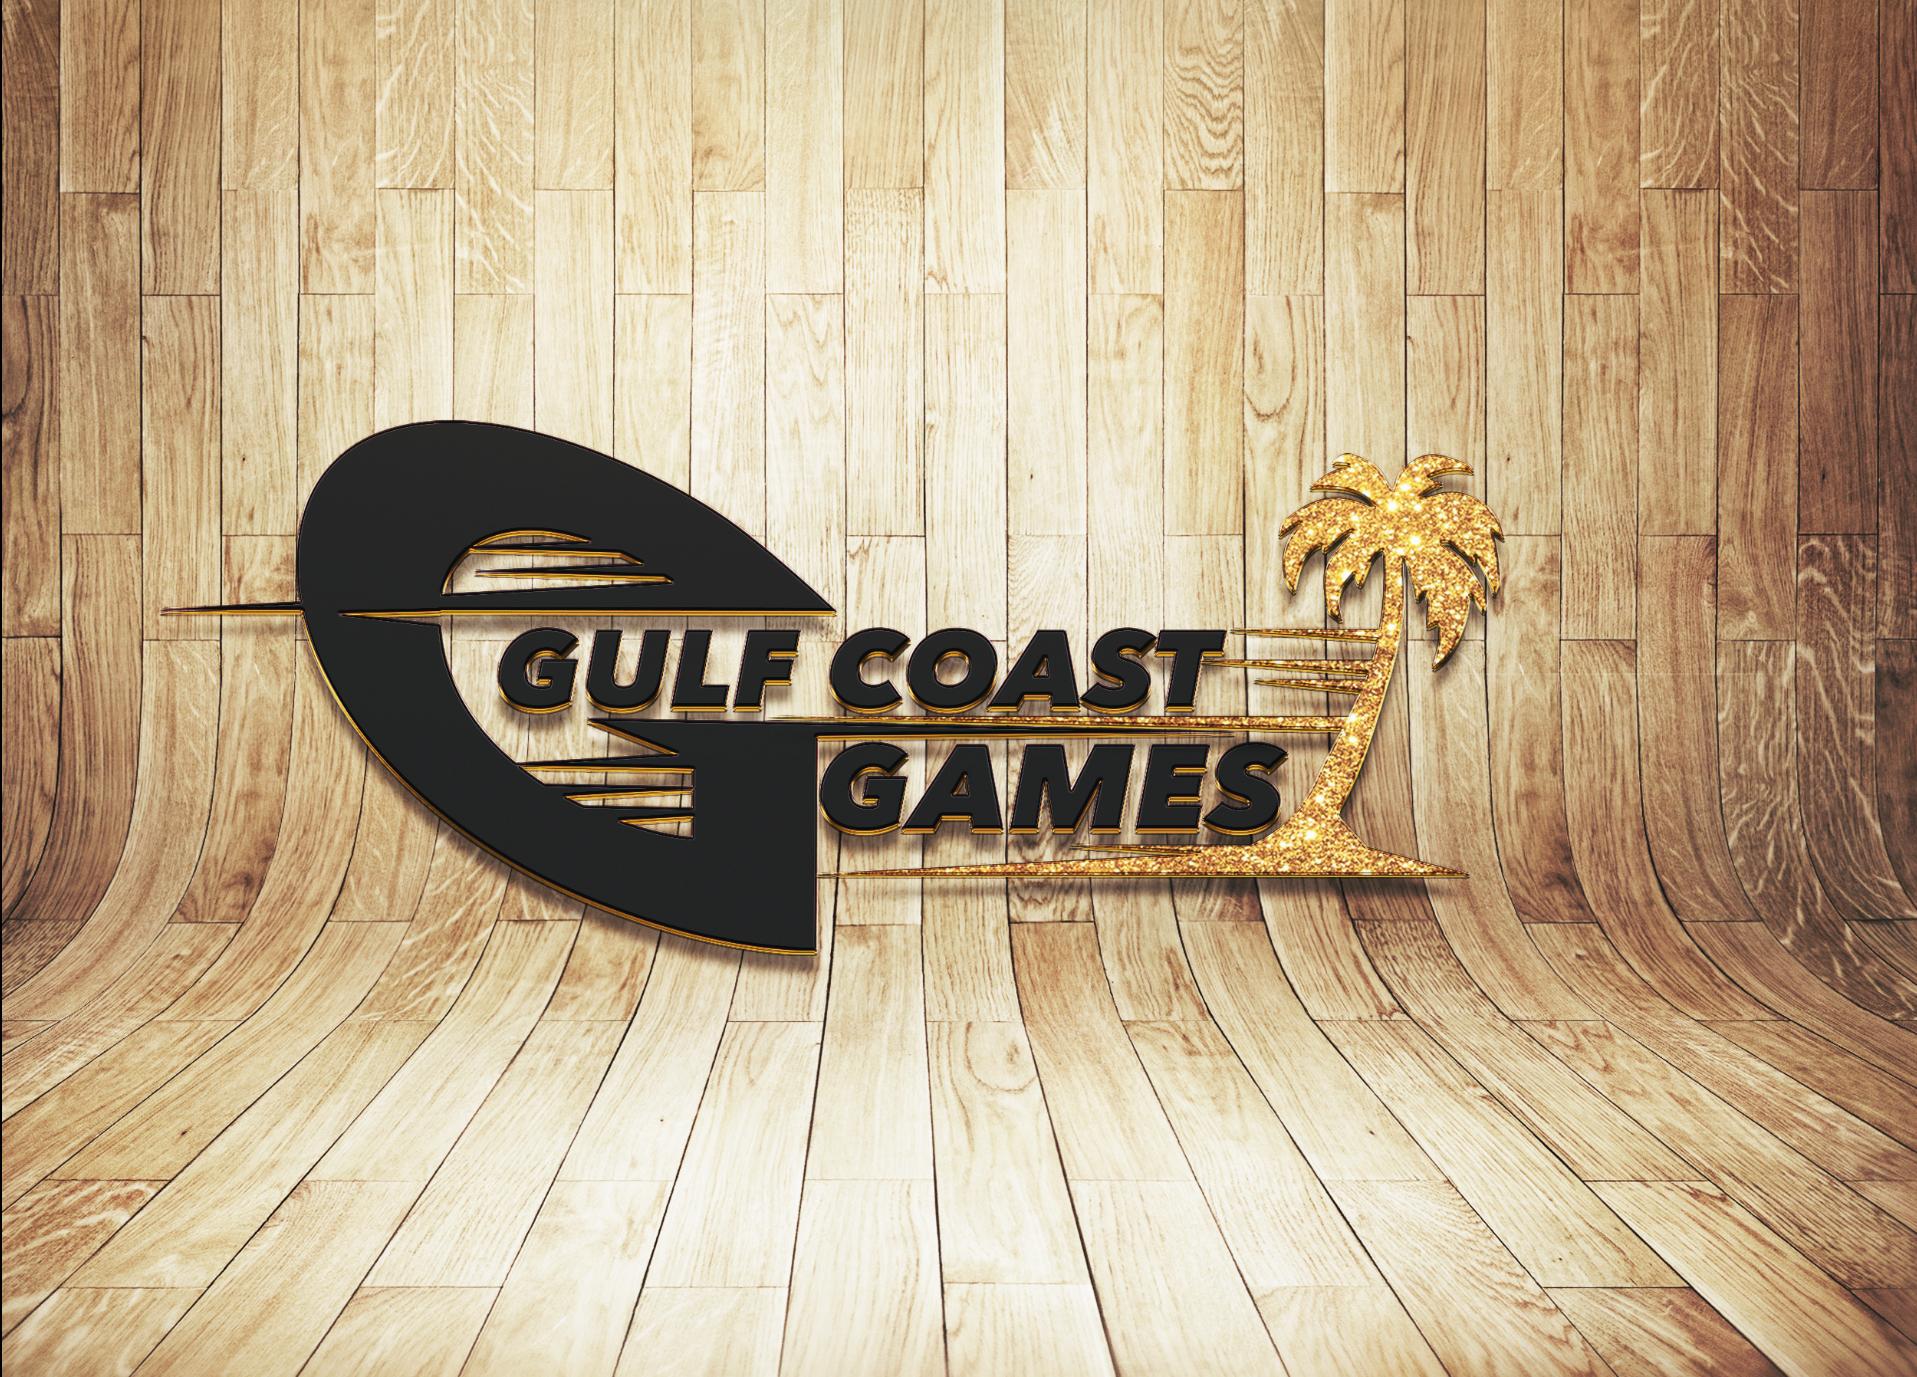 Gulf Coast Games